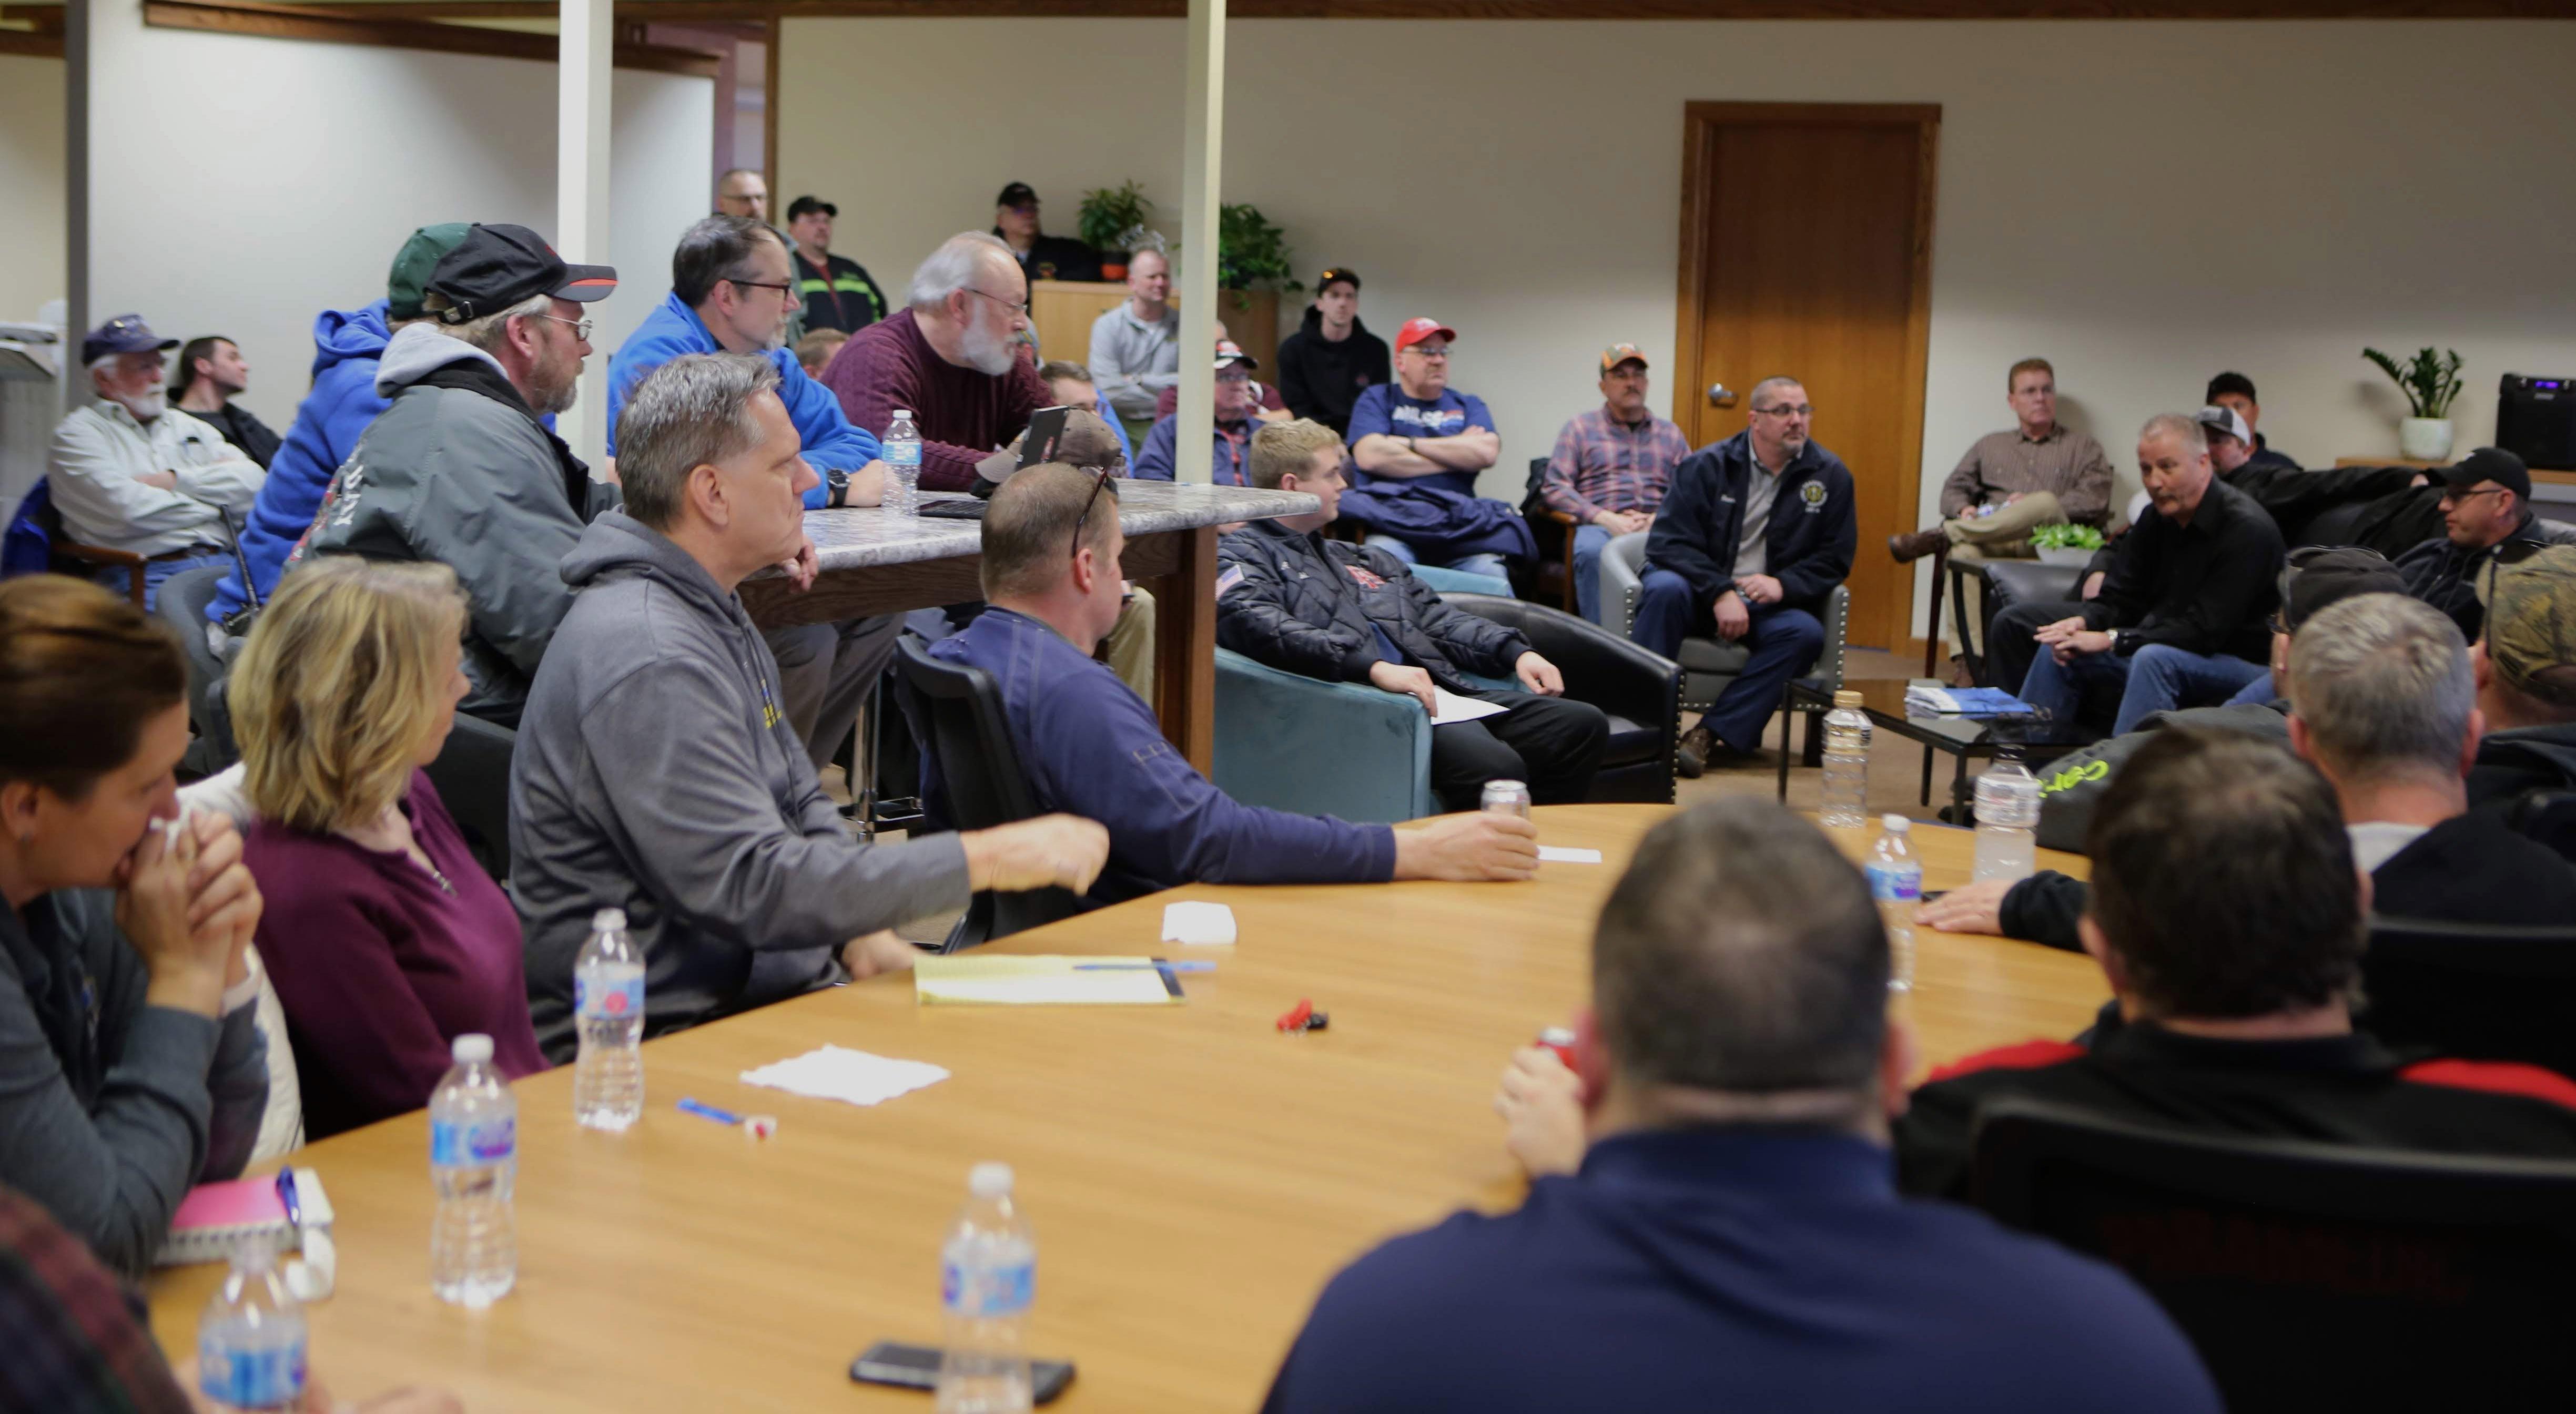 EMS at Portage Health Foundation Brainstorming